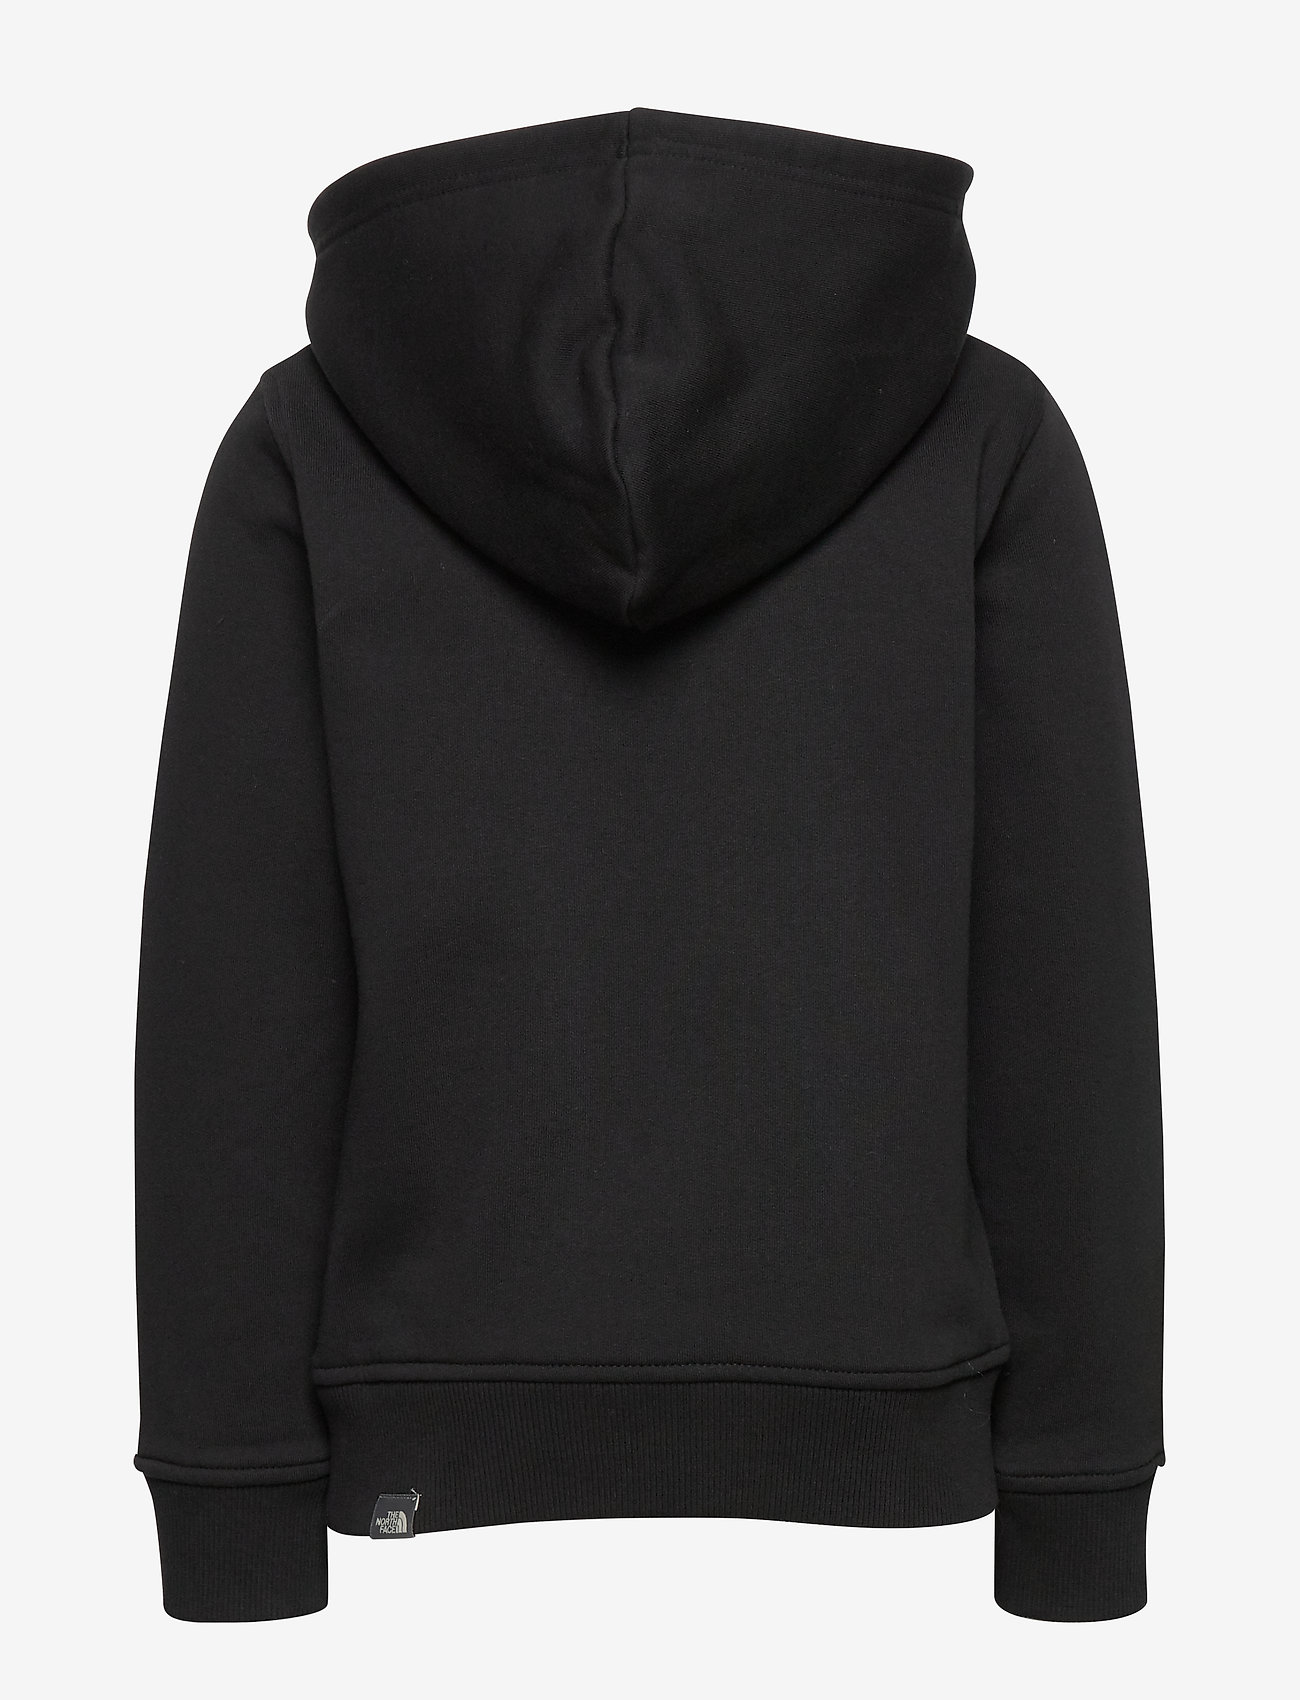 The North Face - Y DREW PEAK P/O HD - kapuzenpullover - tnf black-tnf black - 1